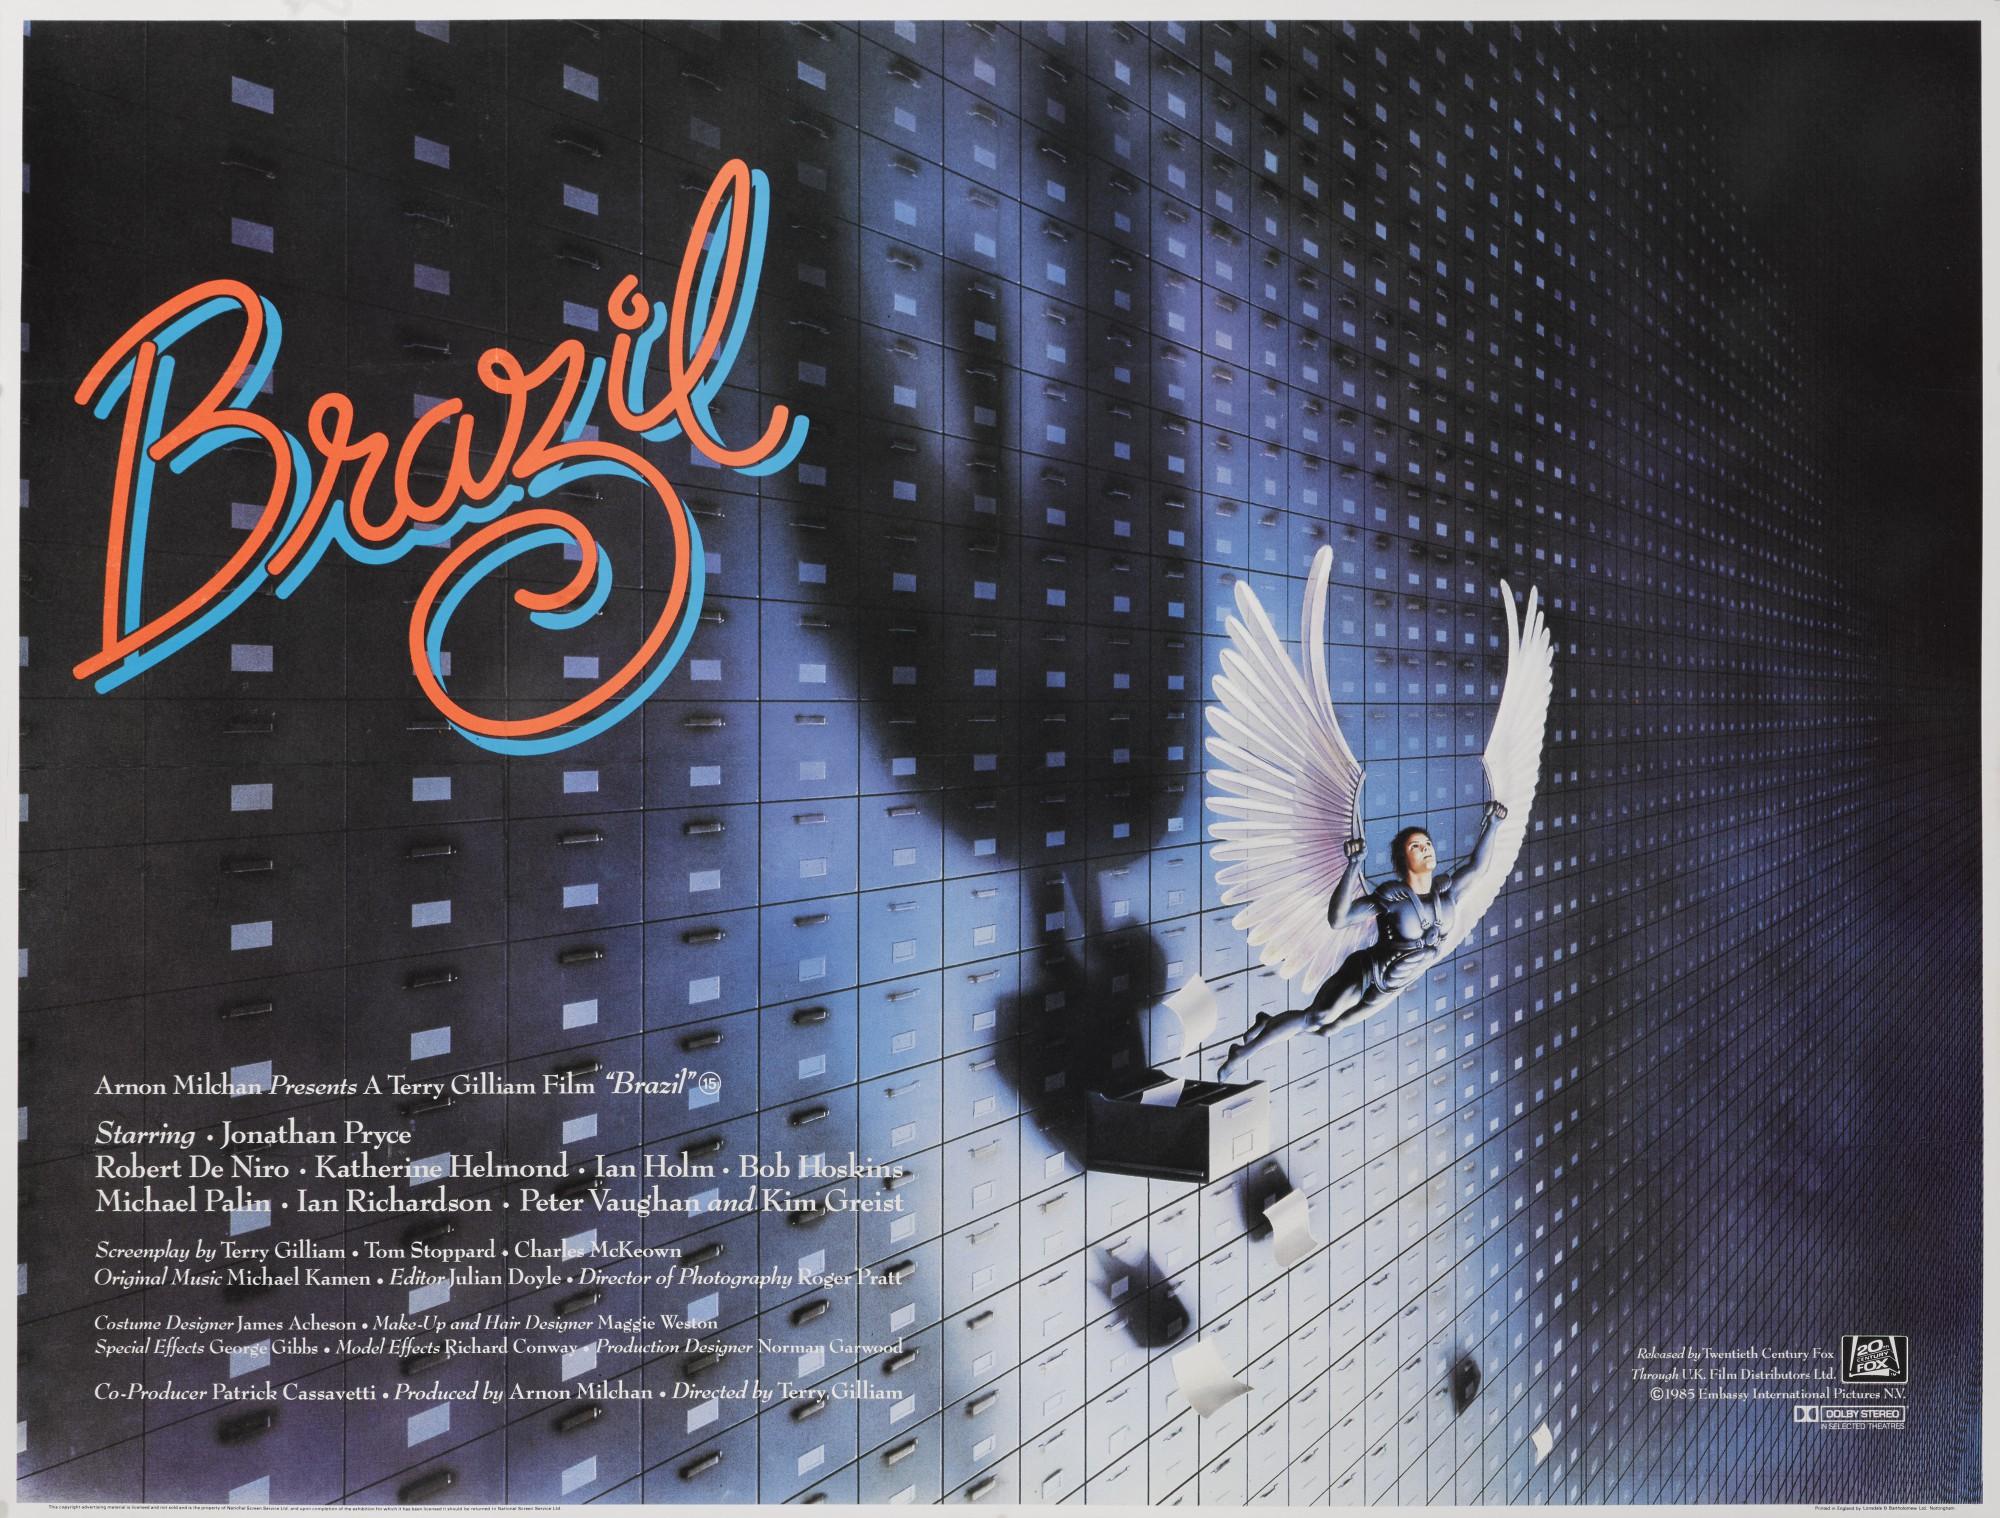 BRAZIL (1985) POSTER, BRITISH | Original Film Posters Online